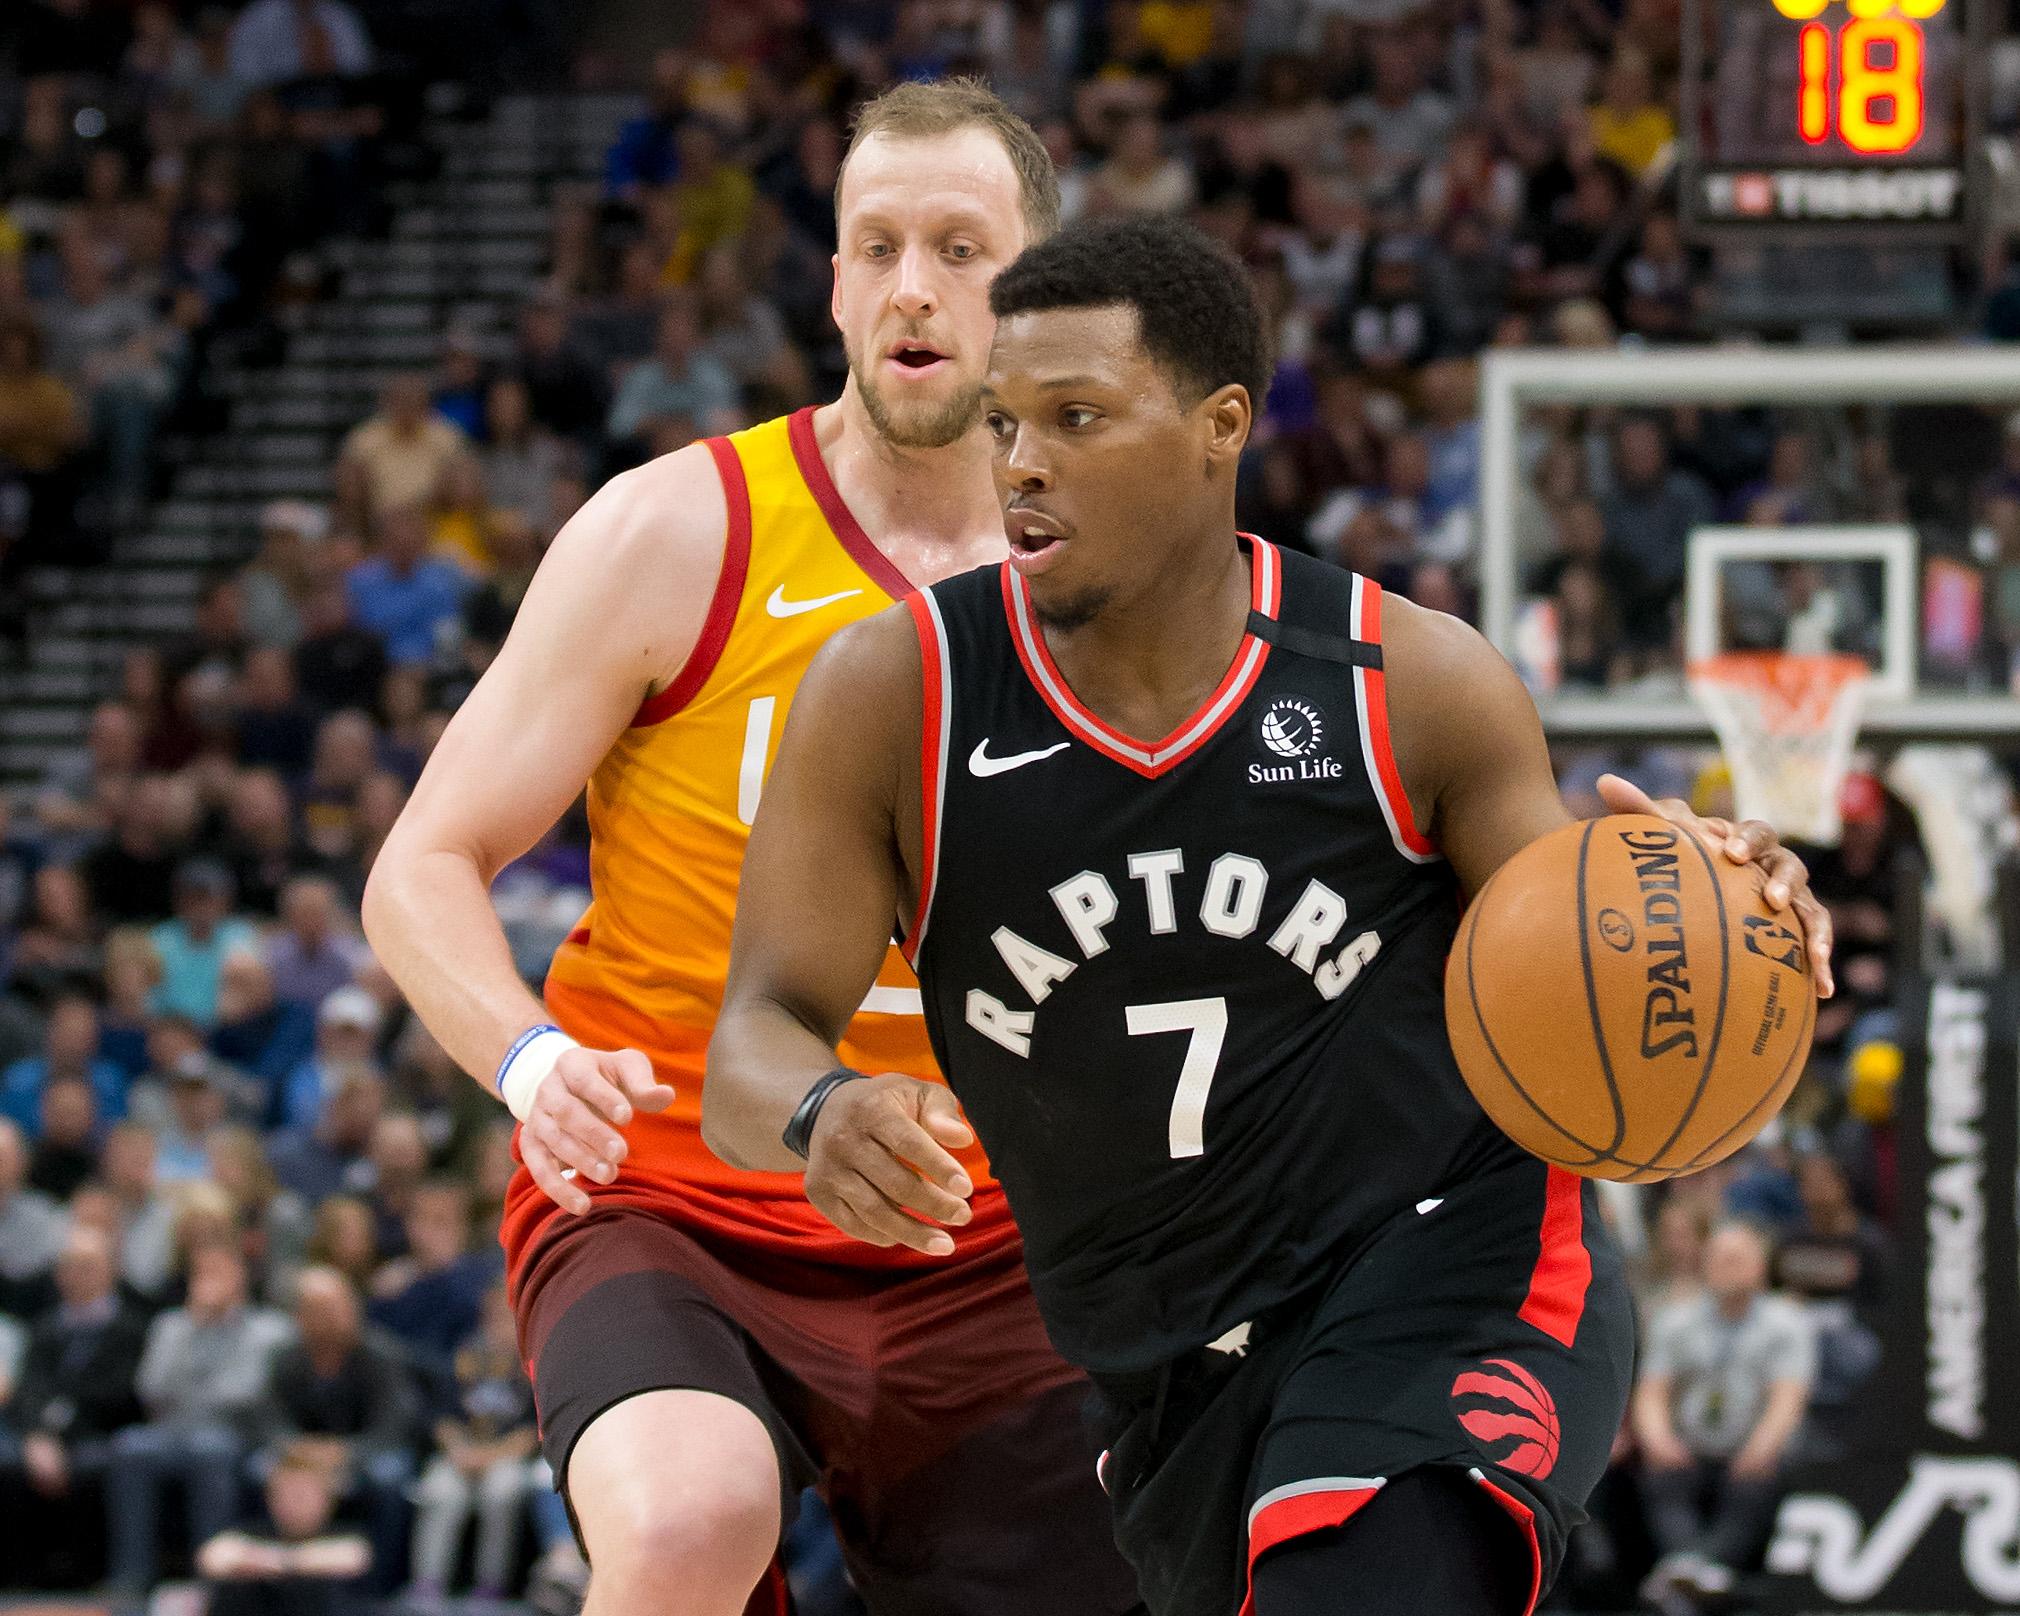 Toronto Raptors guard Kyle Lowry dribbles the ball ahead of Utah Jazz guard Joe Ingles during the first half at Vivint Smart Home Arena.